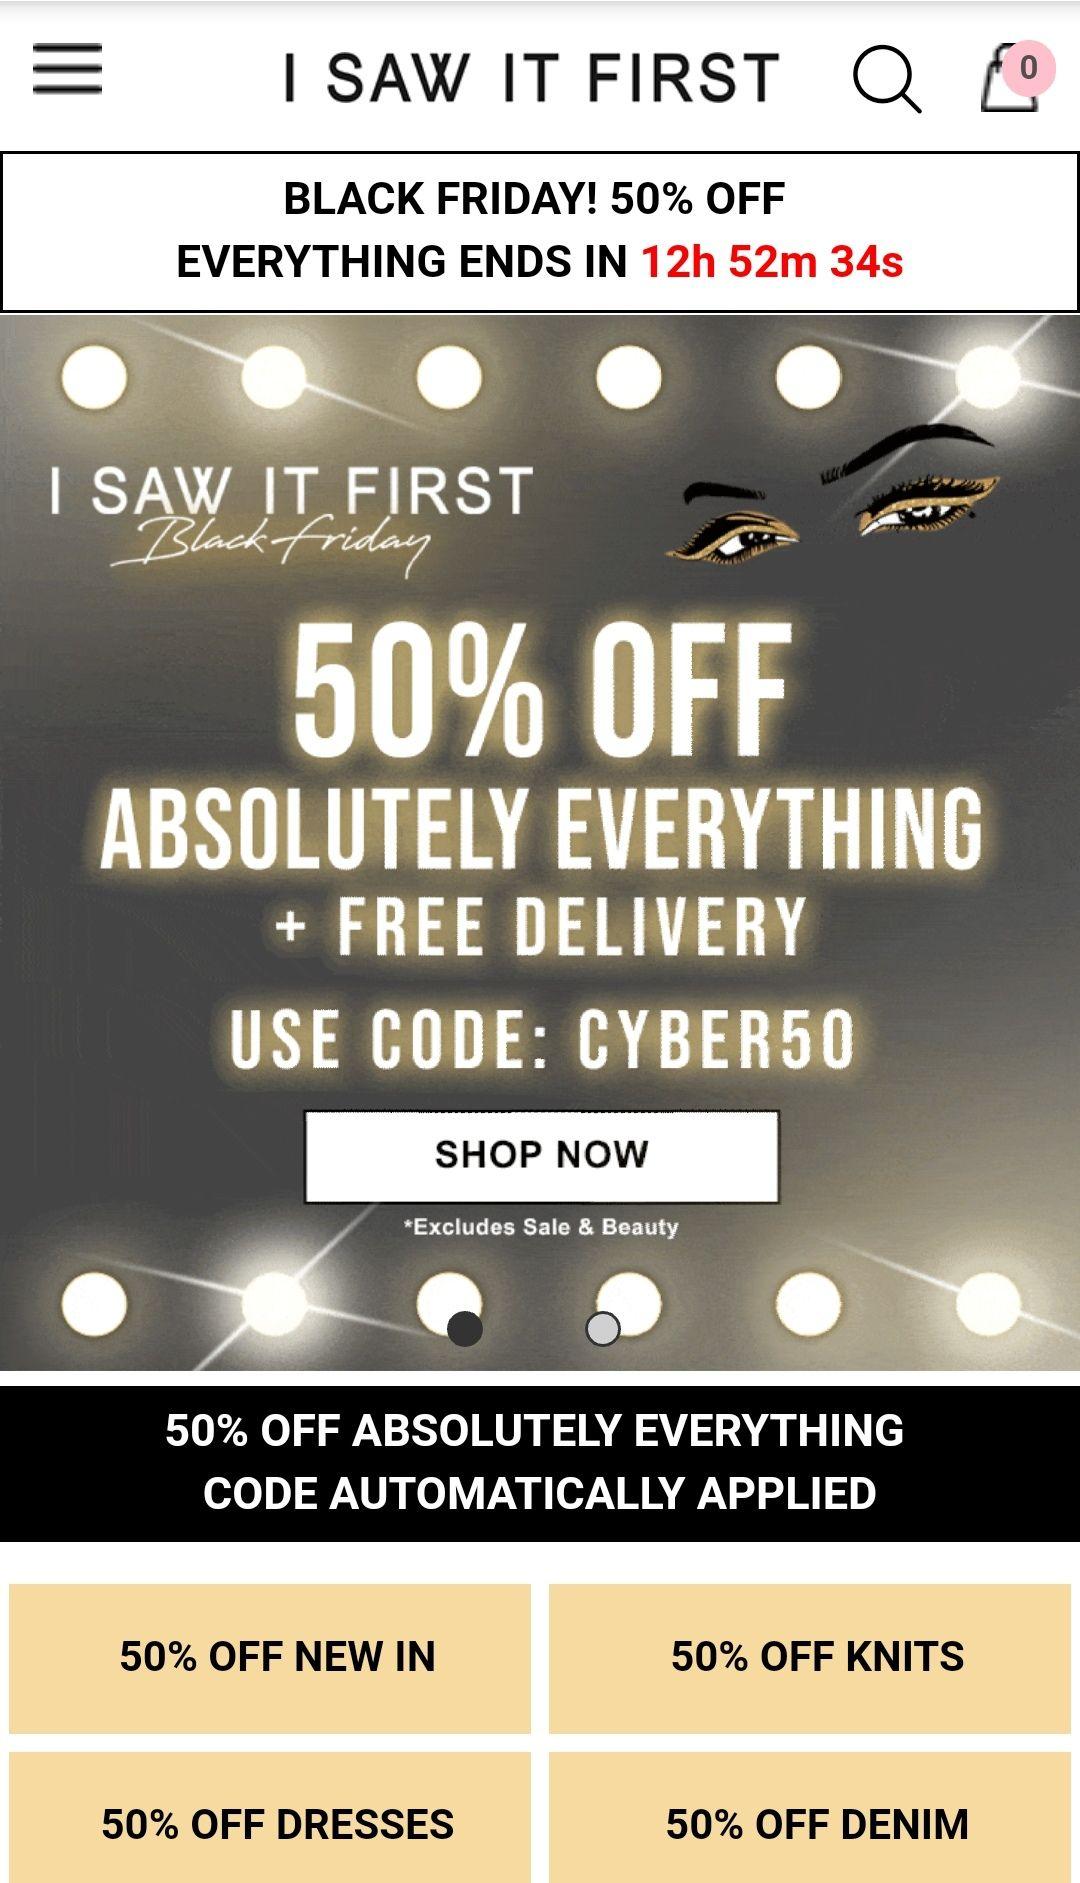 I saw it first BLACK FRIDAY 50% korting + gratis verzending